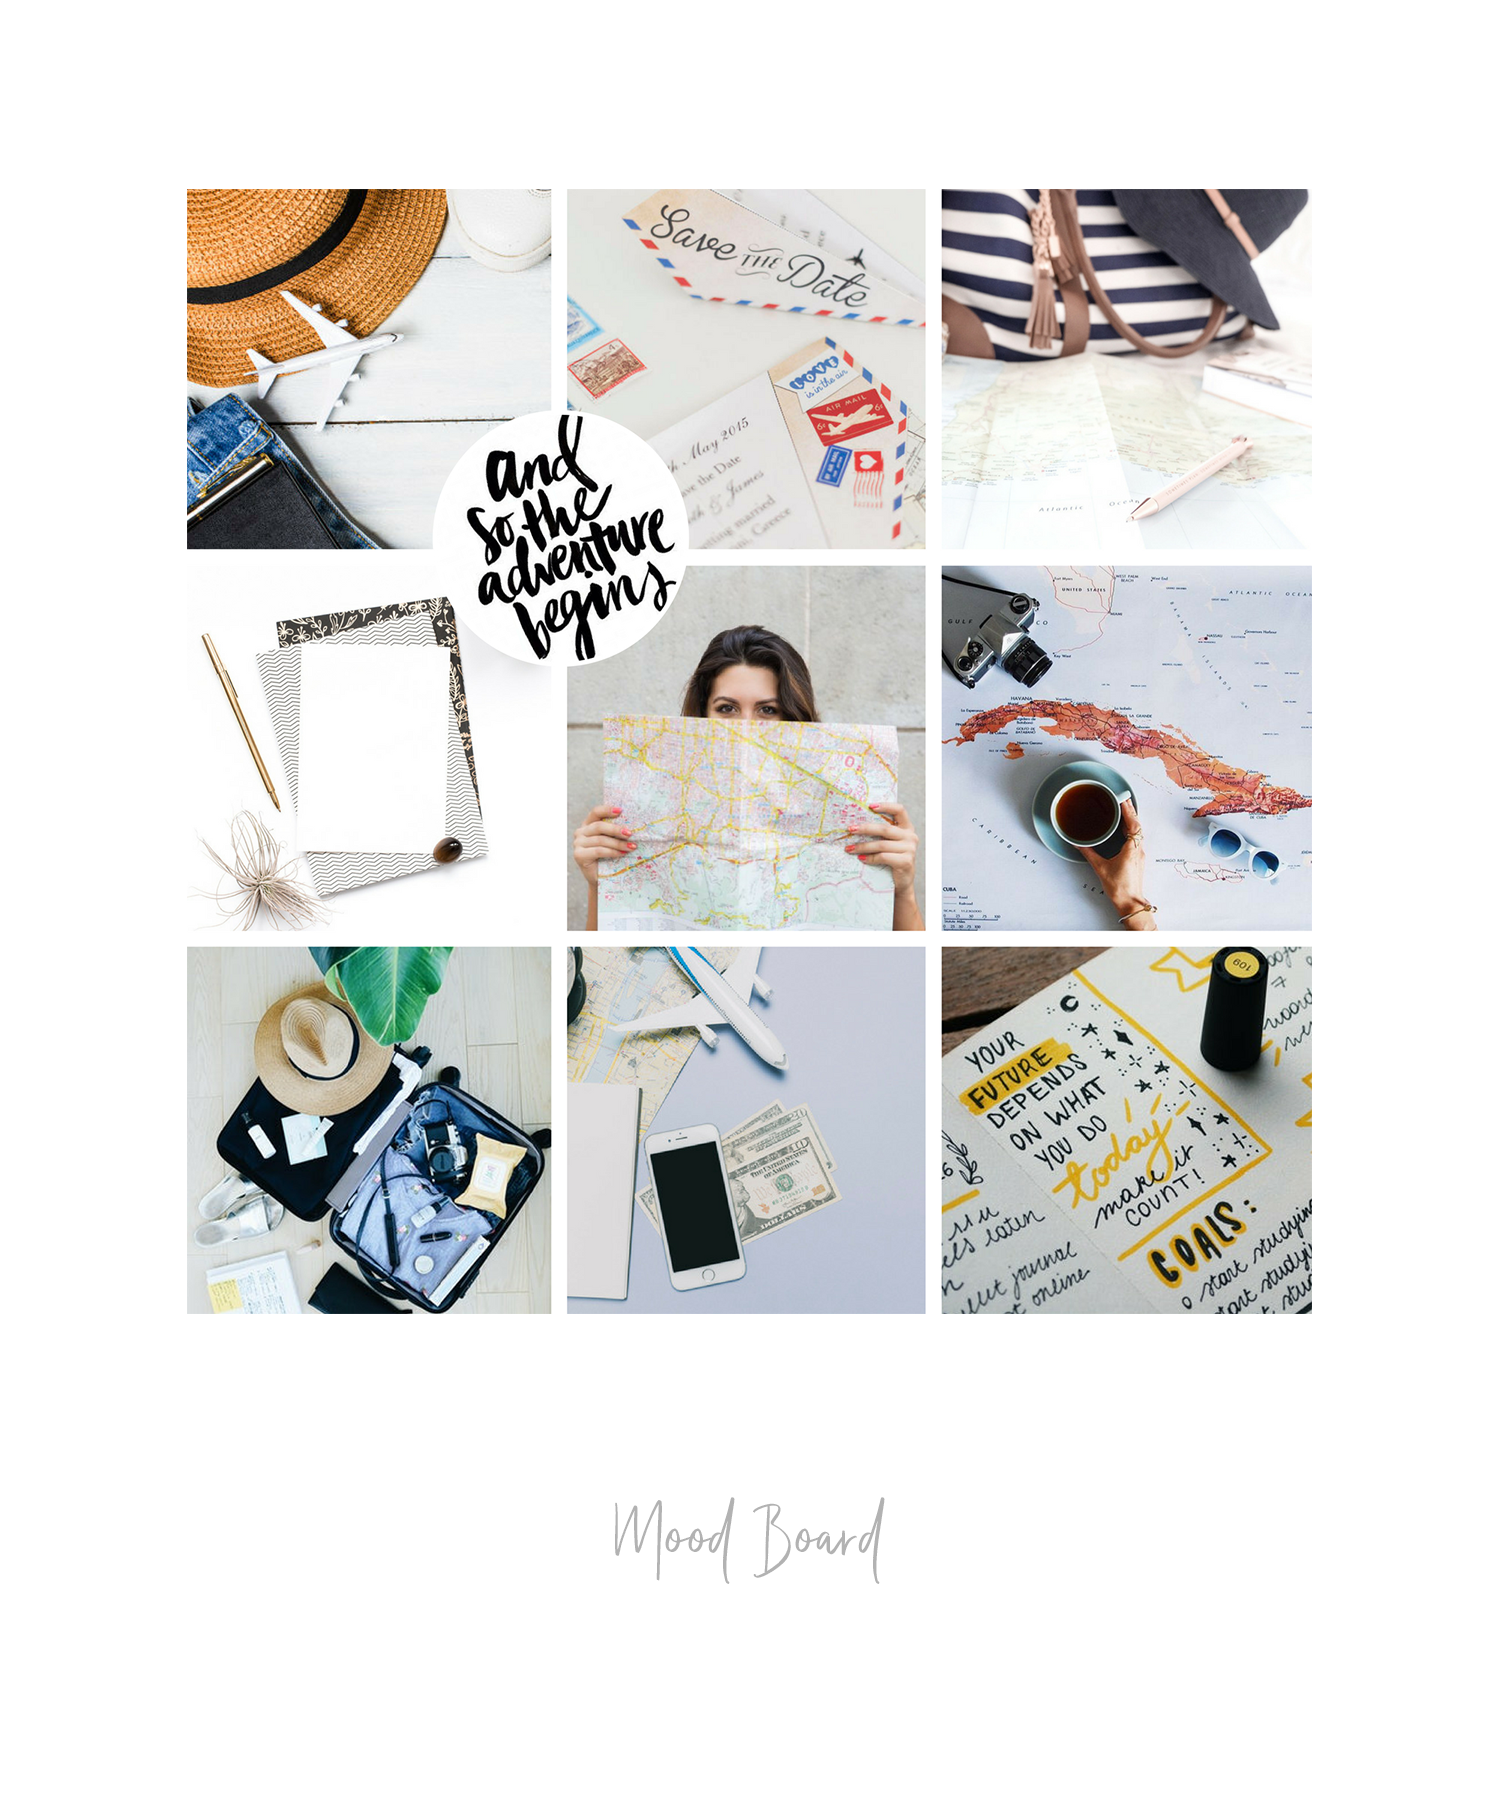 Mood board example for Custom Brand - Pinterest moodboard